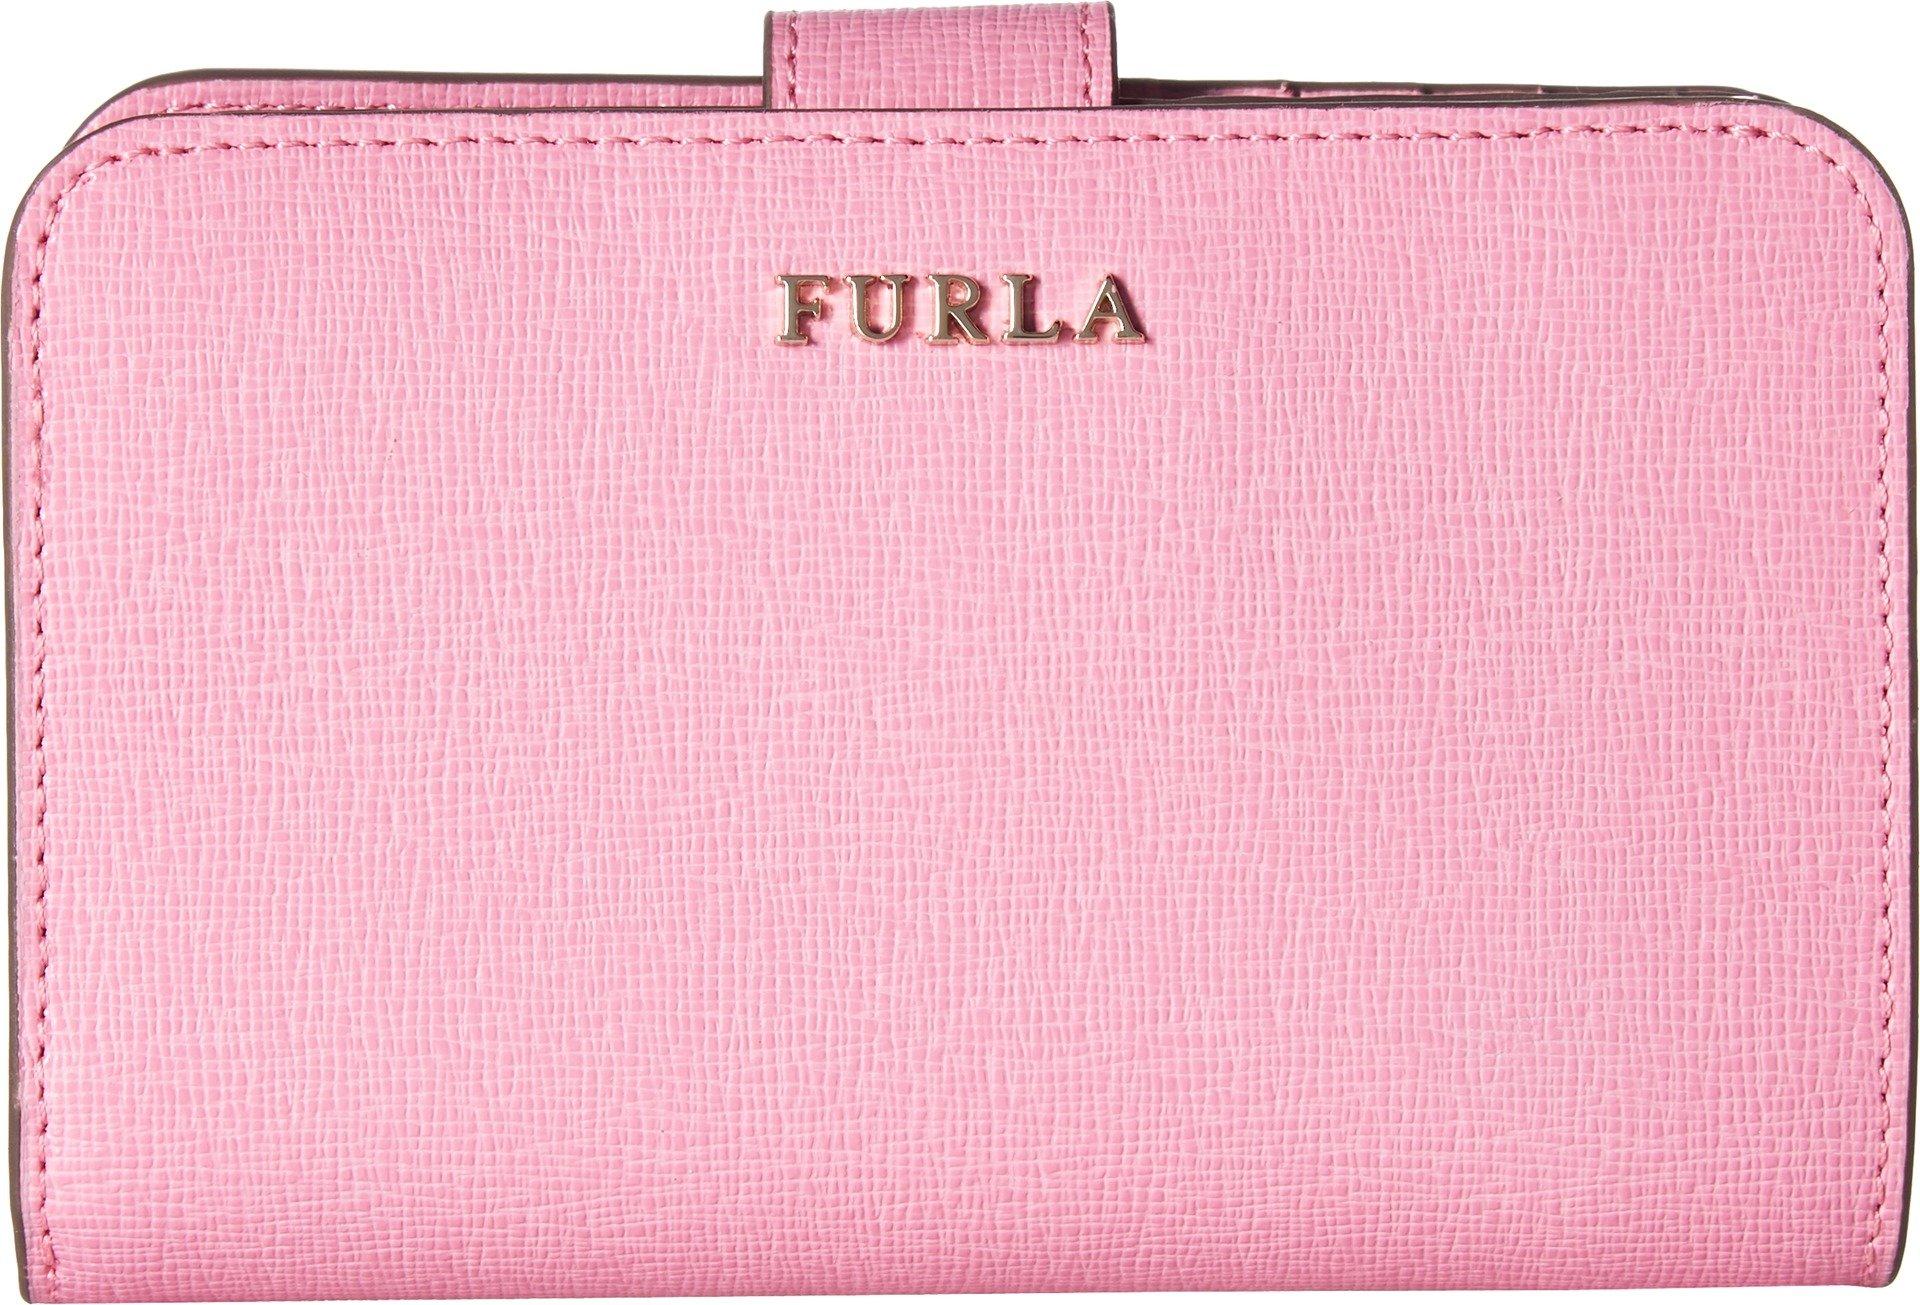 Furla Women's Babylon Medium Zip Around Orchidea One Size by Furla